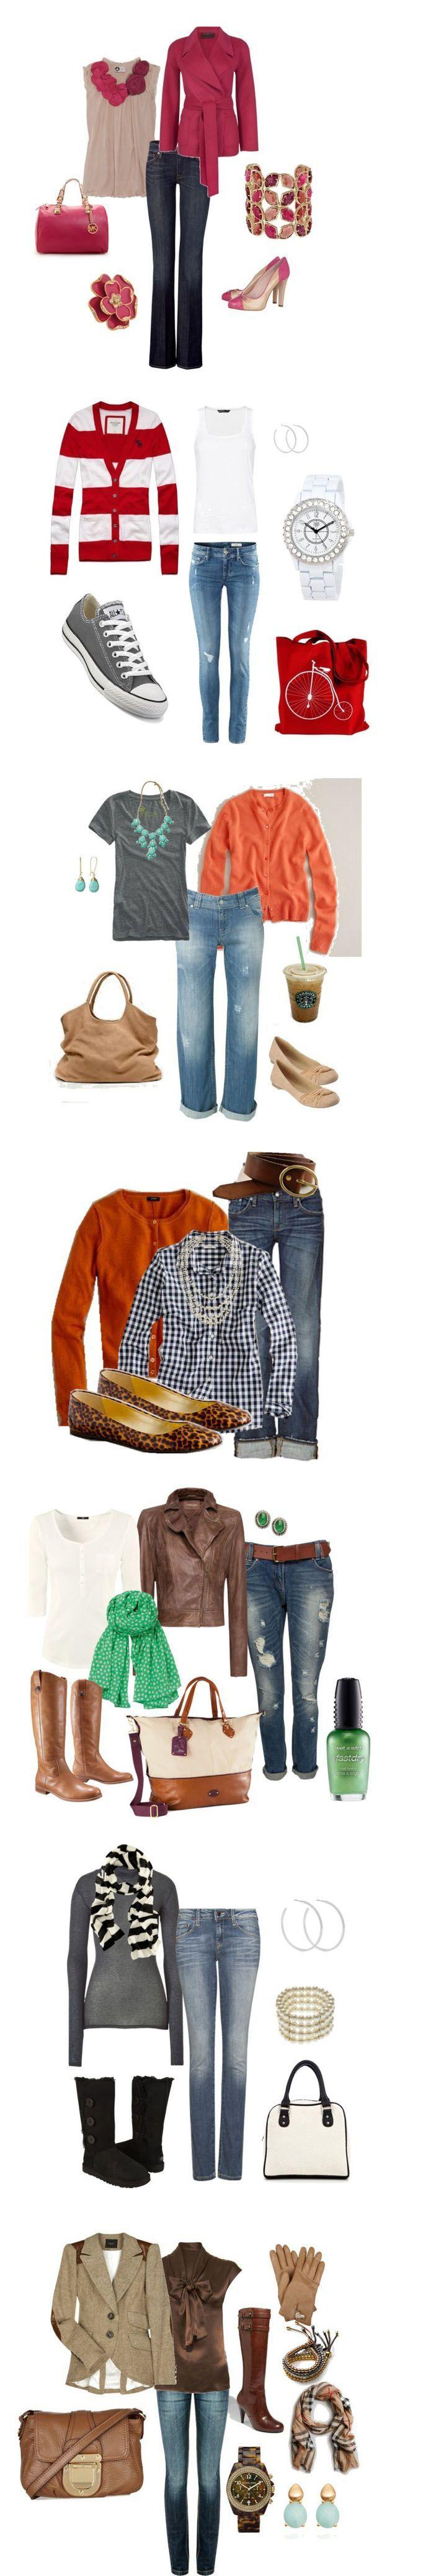 Coloful Fall Fashions | Fashion Style